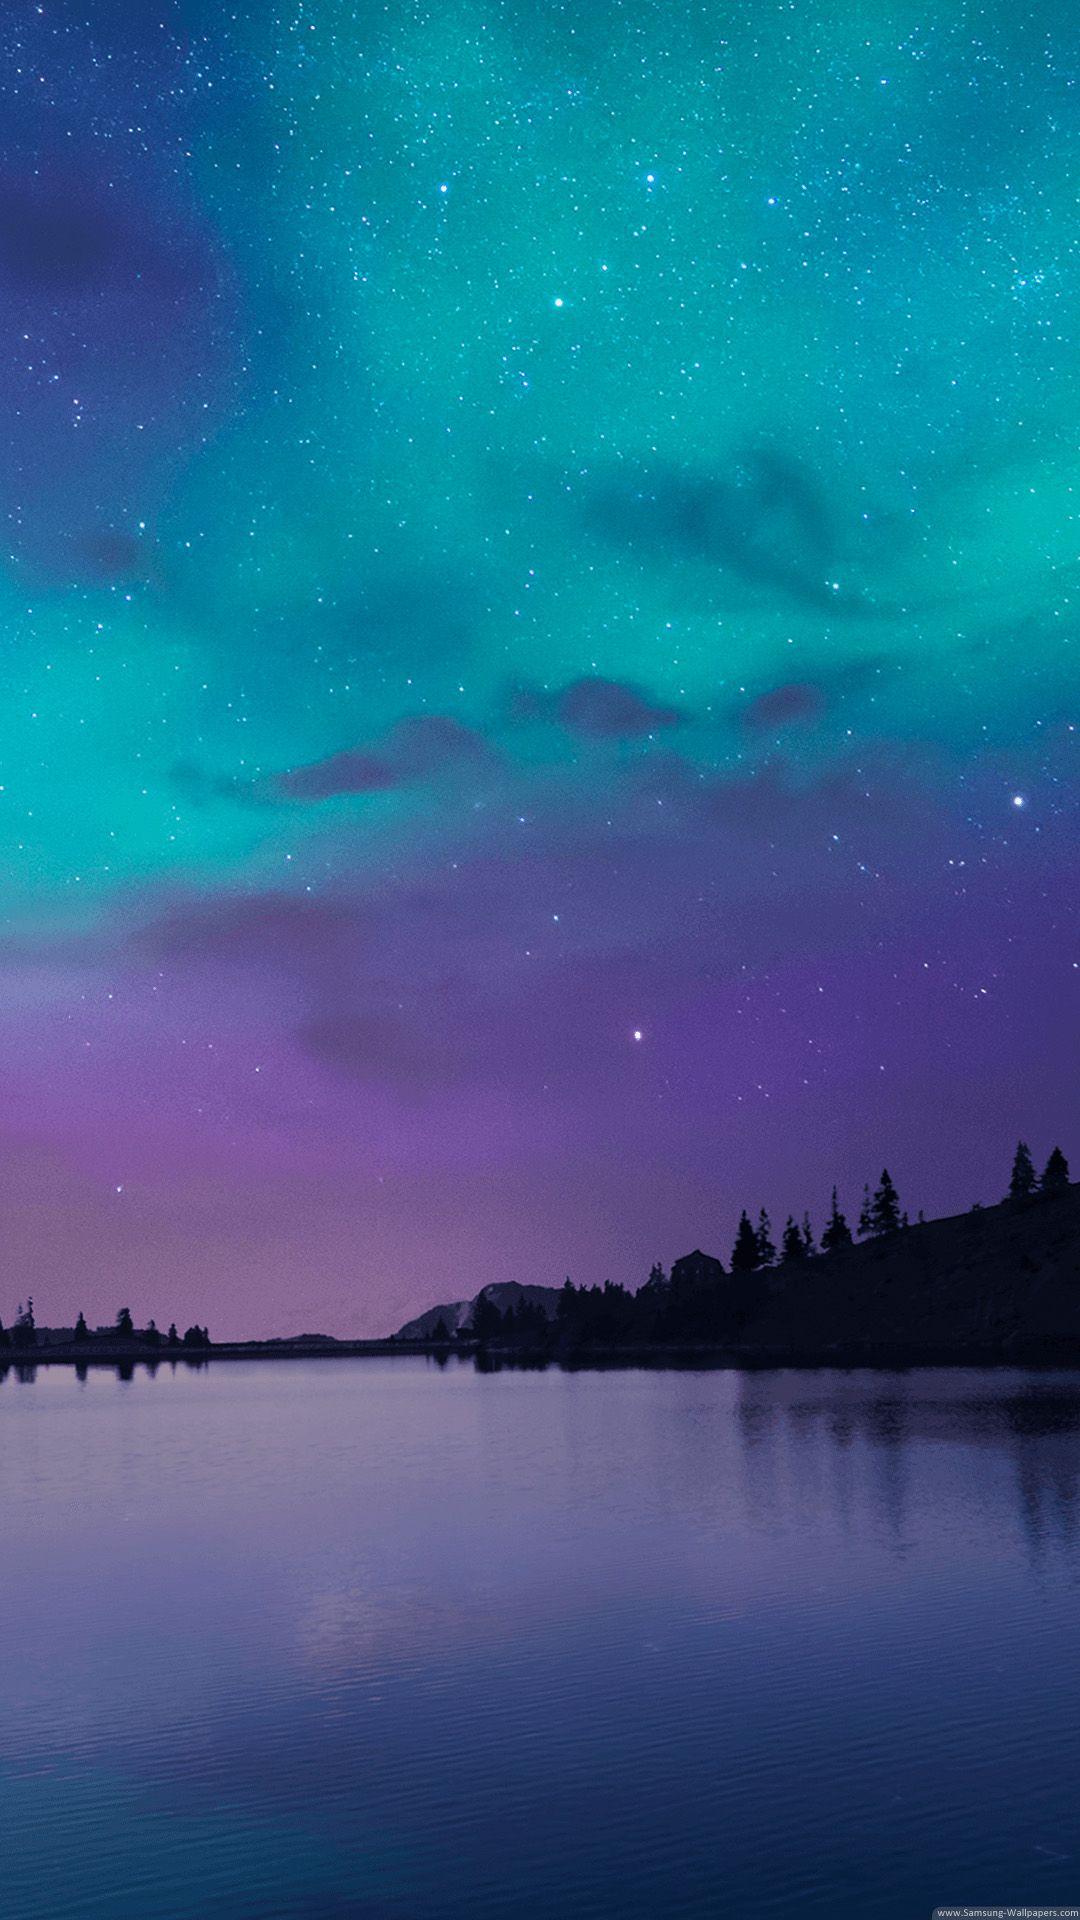 Natural Night Lock Screen Night Sky Wallpaper Sunset Iphone Wallpaper Iphone Wallpaper Sky